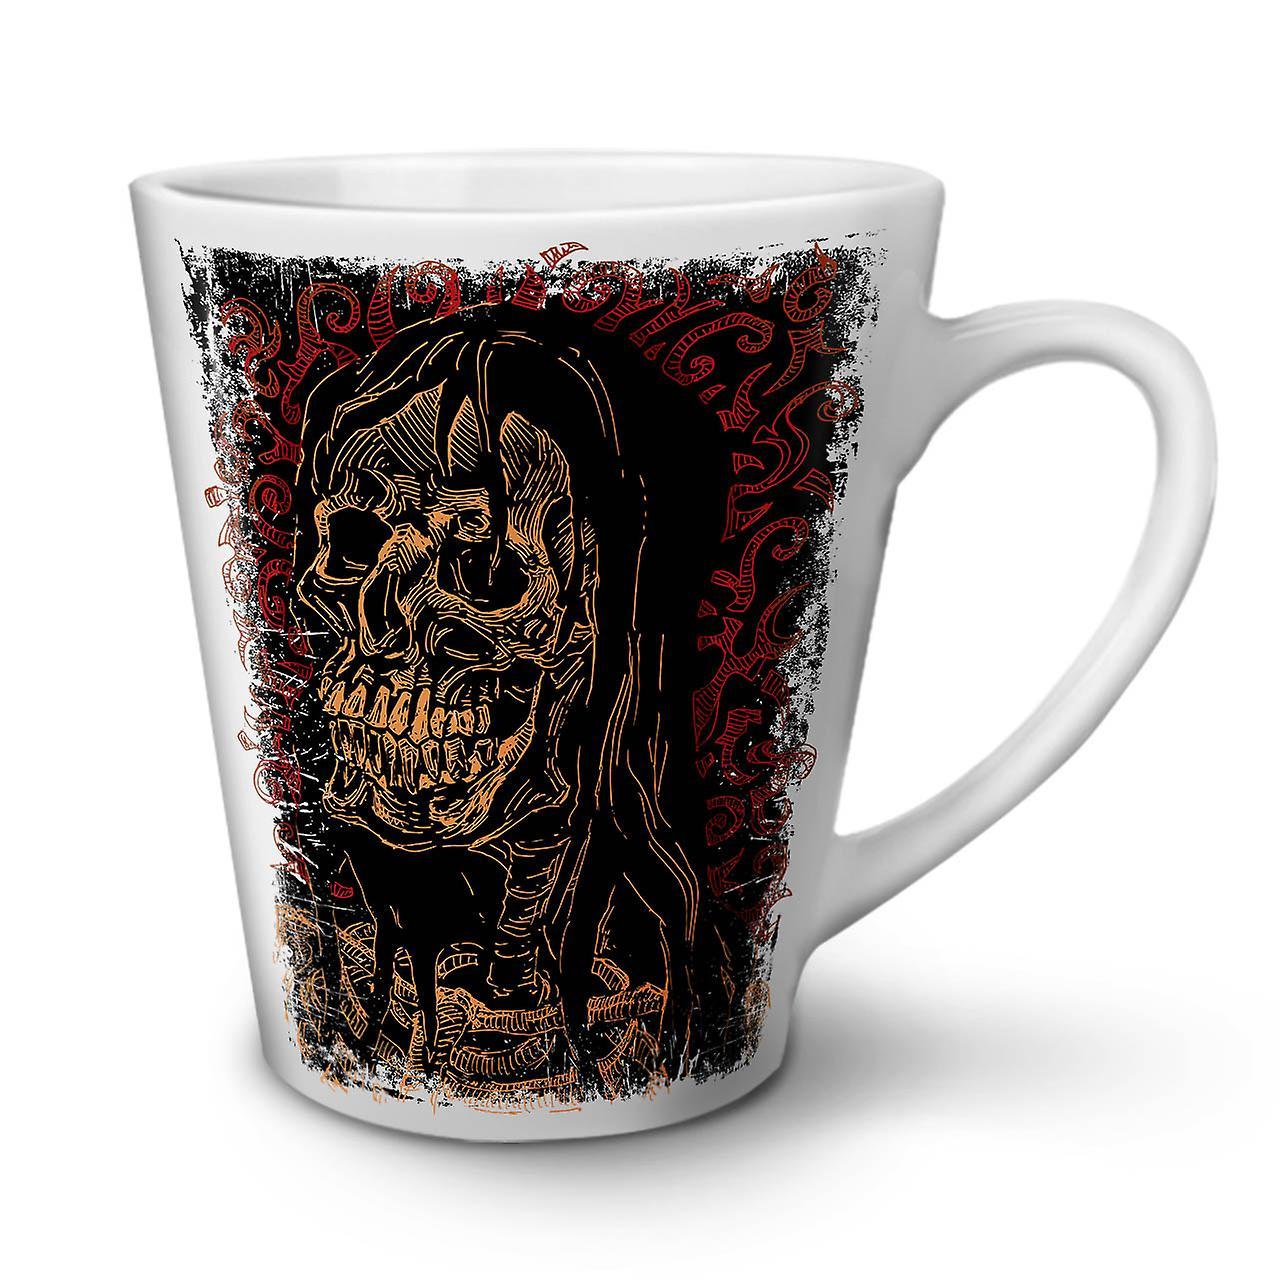 Death 12 Tasse Nouvelle OzWellcoda Céramique Latte Metal Café Blanche Inaugural En 2EYeD9bWIH